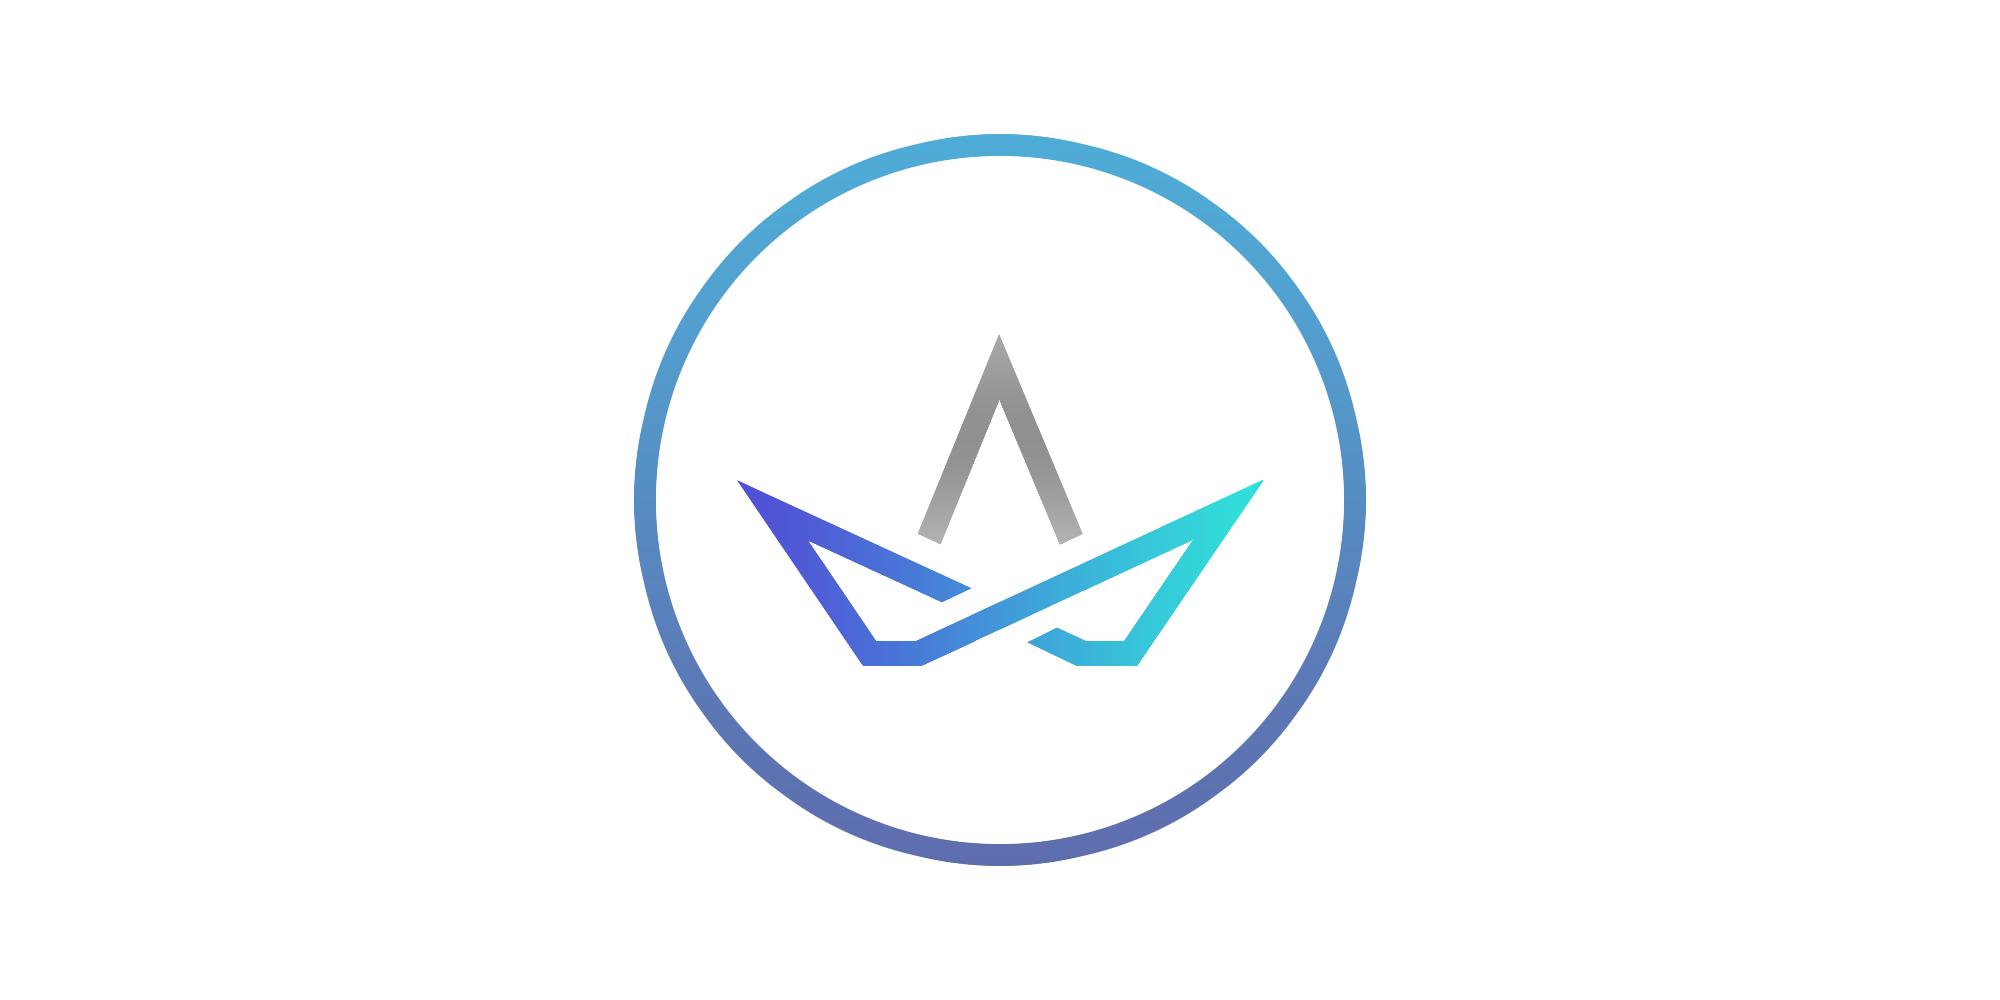 https://www.stratomedia.co.il/wp-content/plugins/kingcomposer/assets/images/get_start.jpg